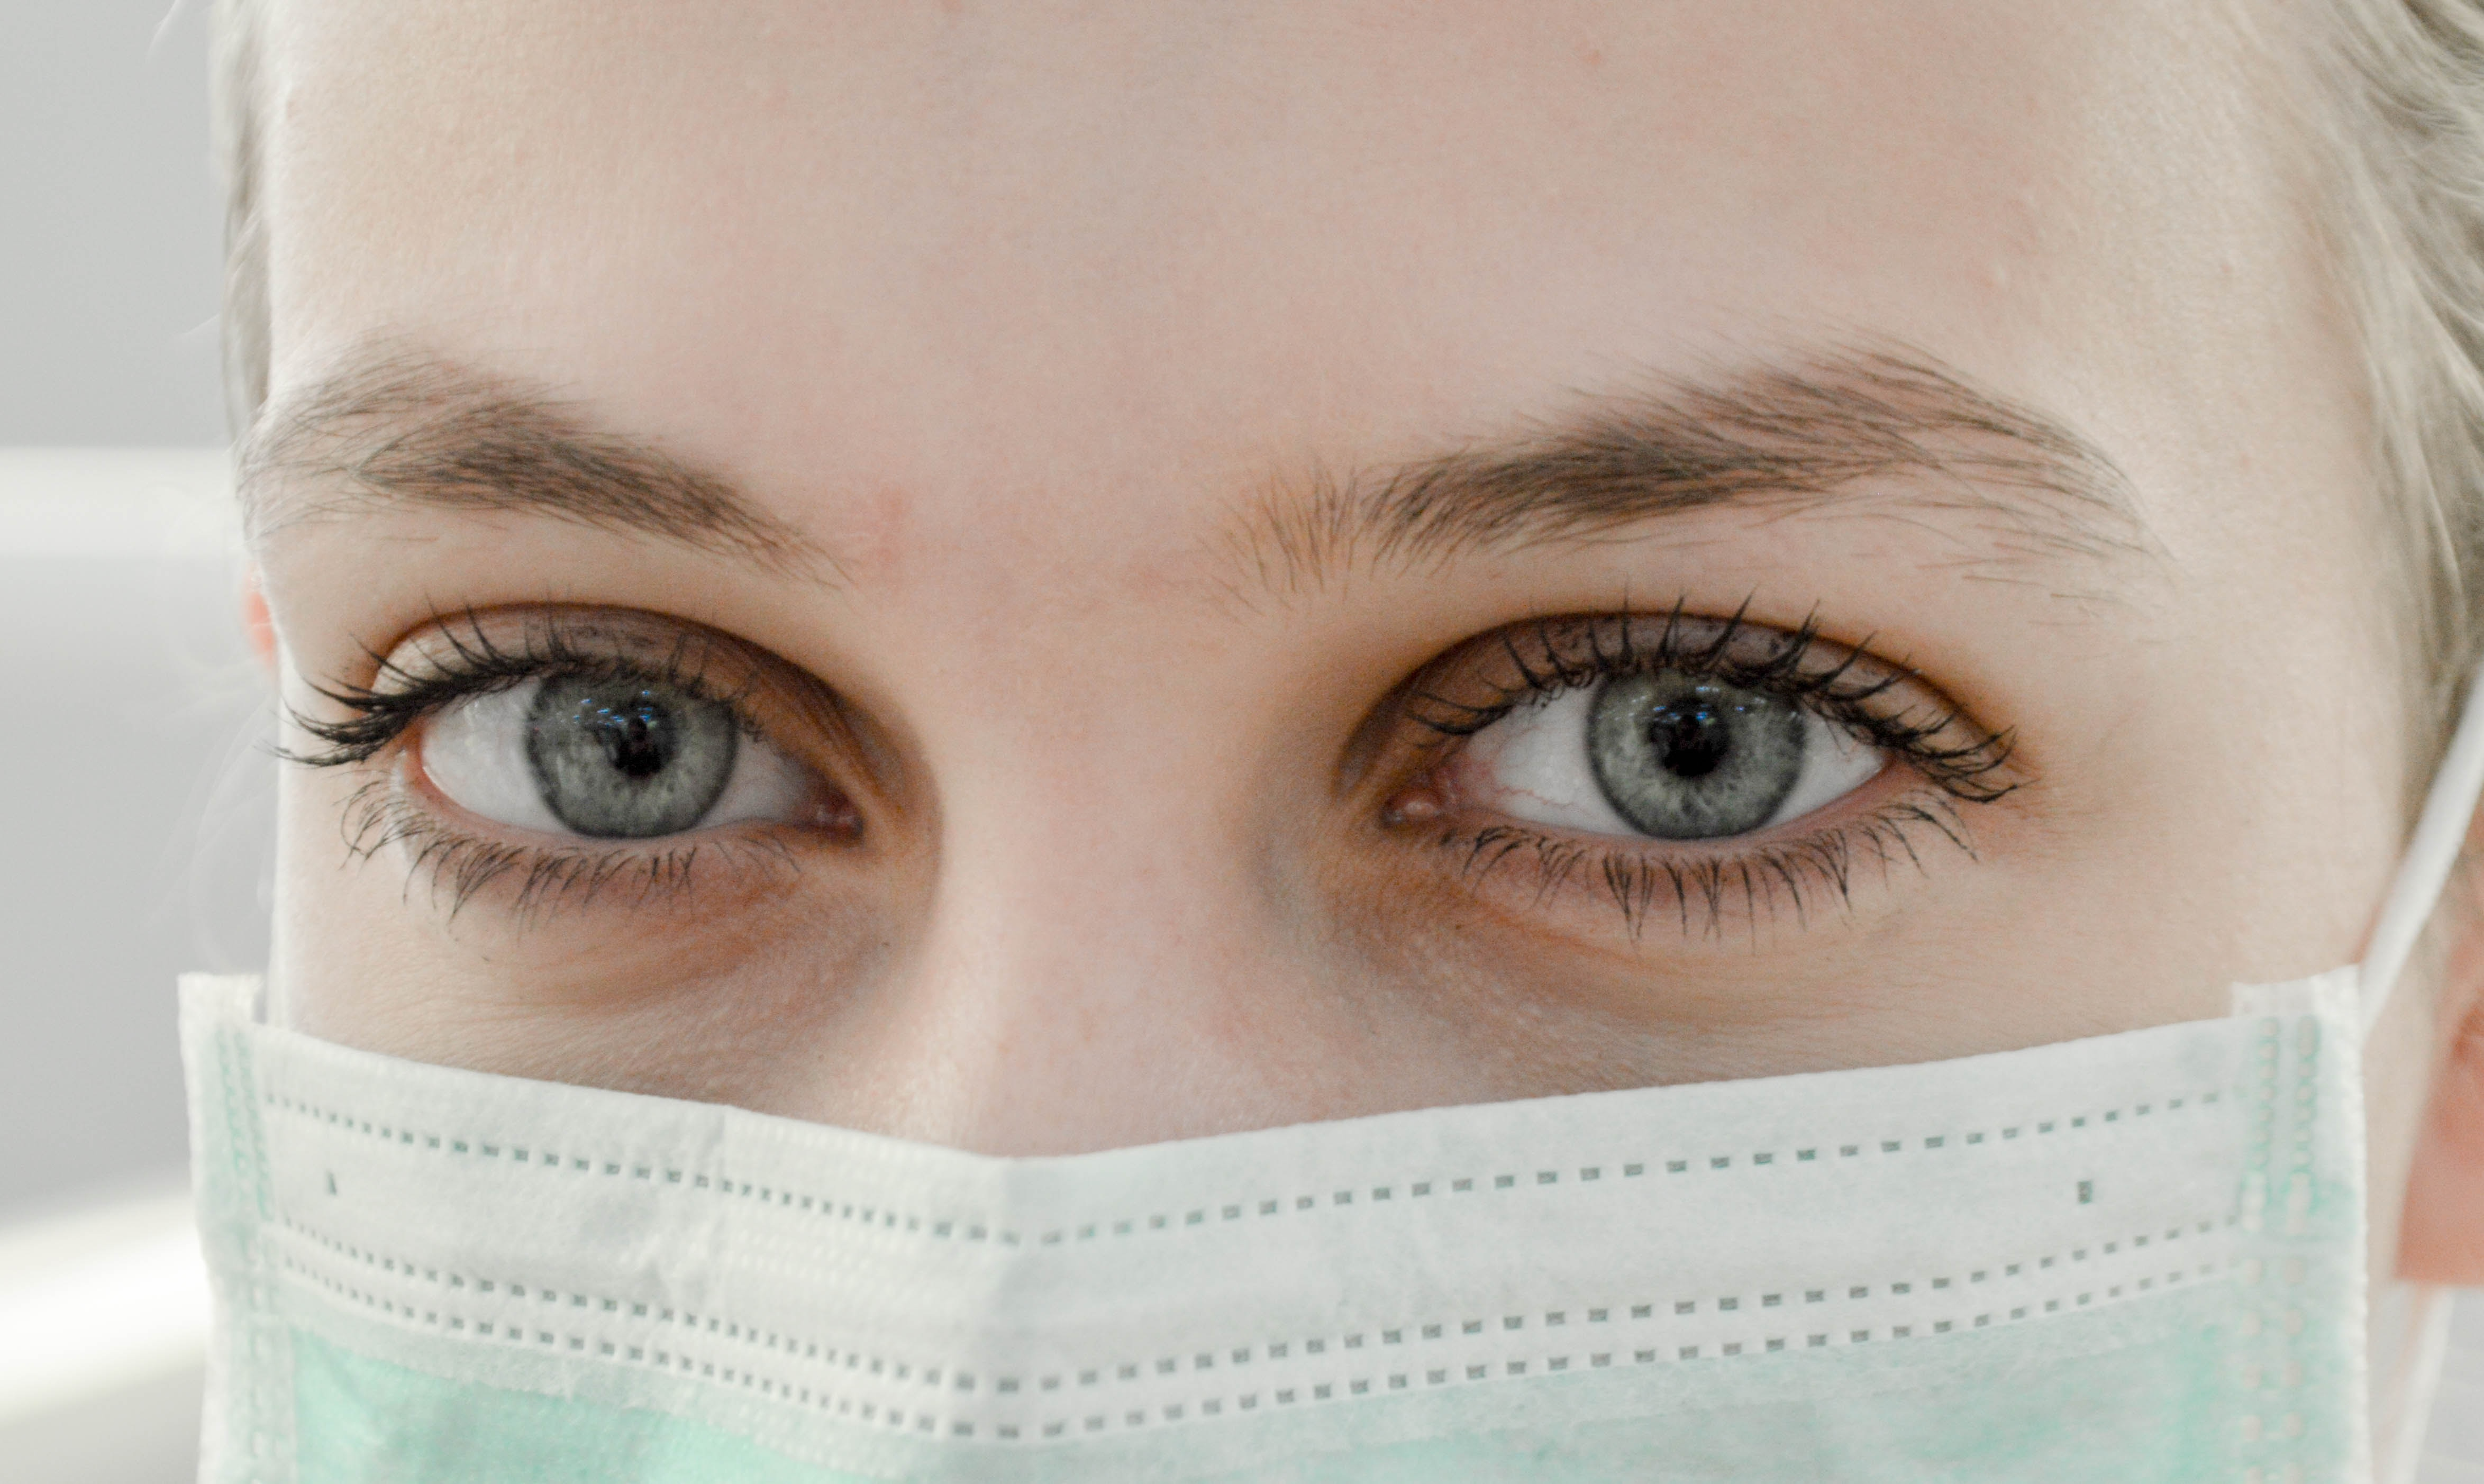 Carolina Oral & Maxillofacial Surgery Fort Mill (803)548-9910